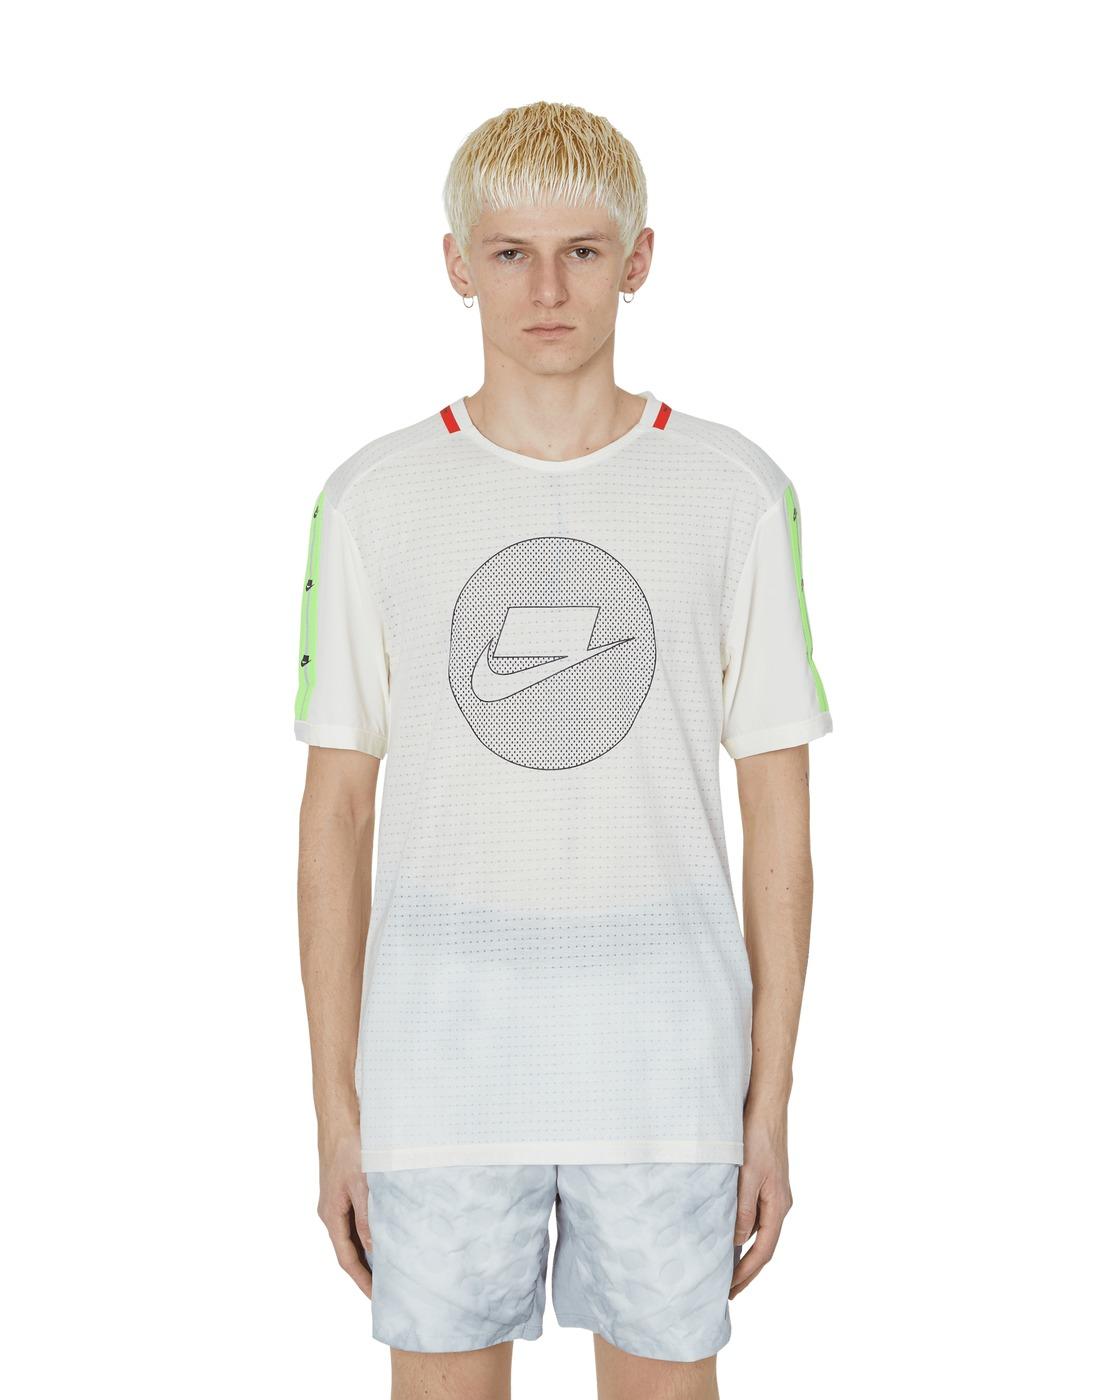 Nike Running Wild Run T Shirt Pale Ivory/Electric Green